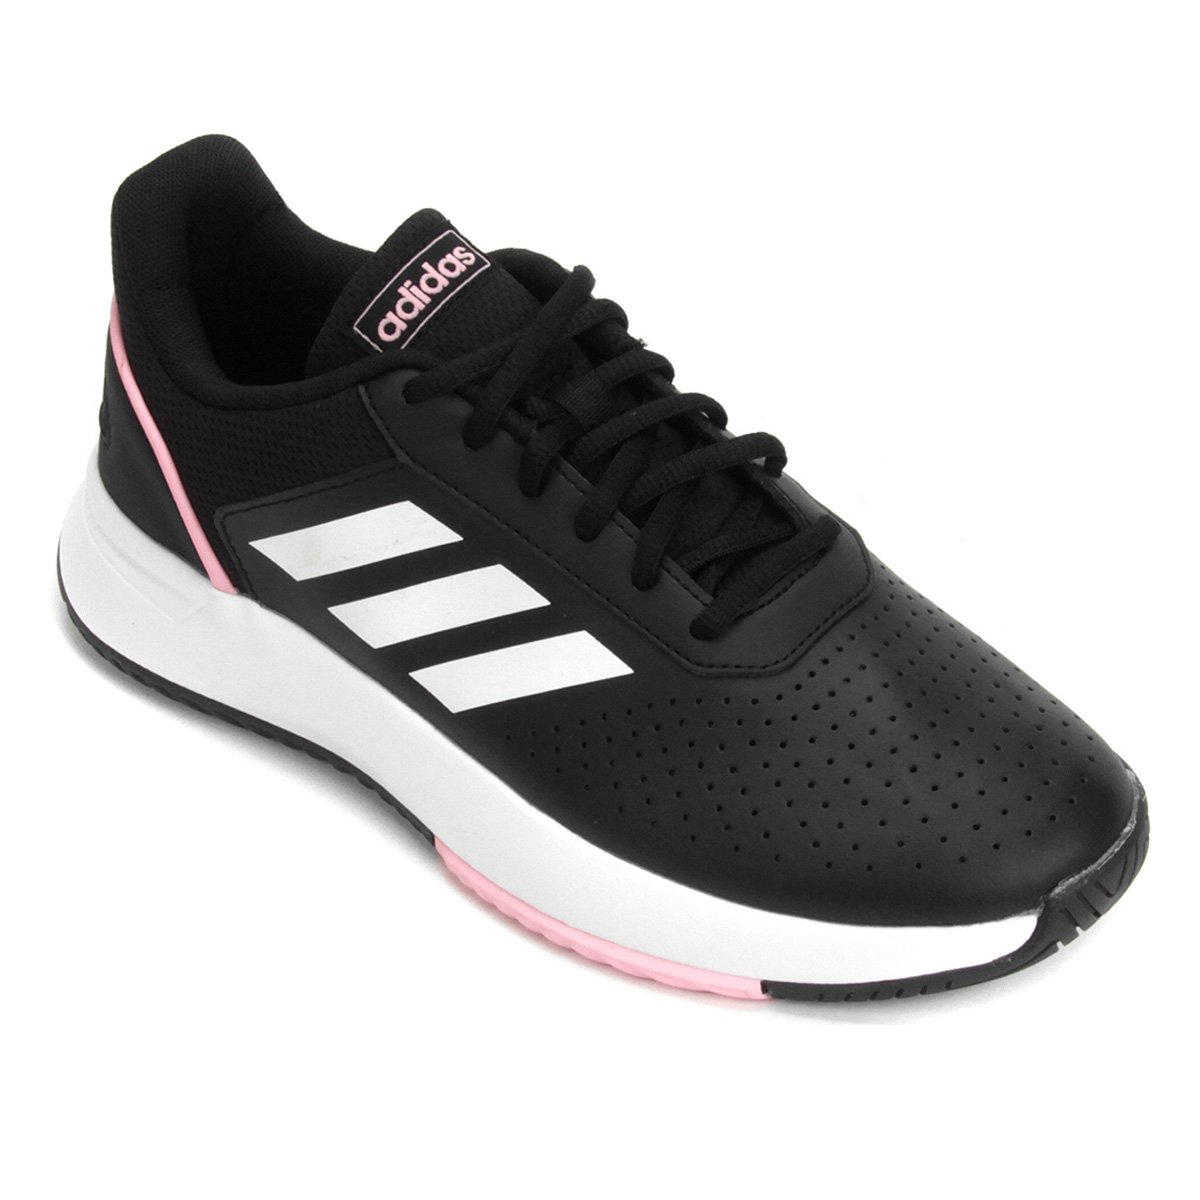 cffeef633d6fd FornecedorNetshoes. Tênis Adidas Courtsmash Feminino